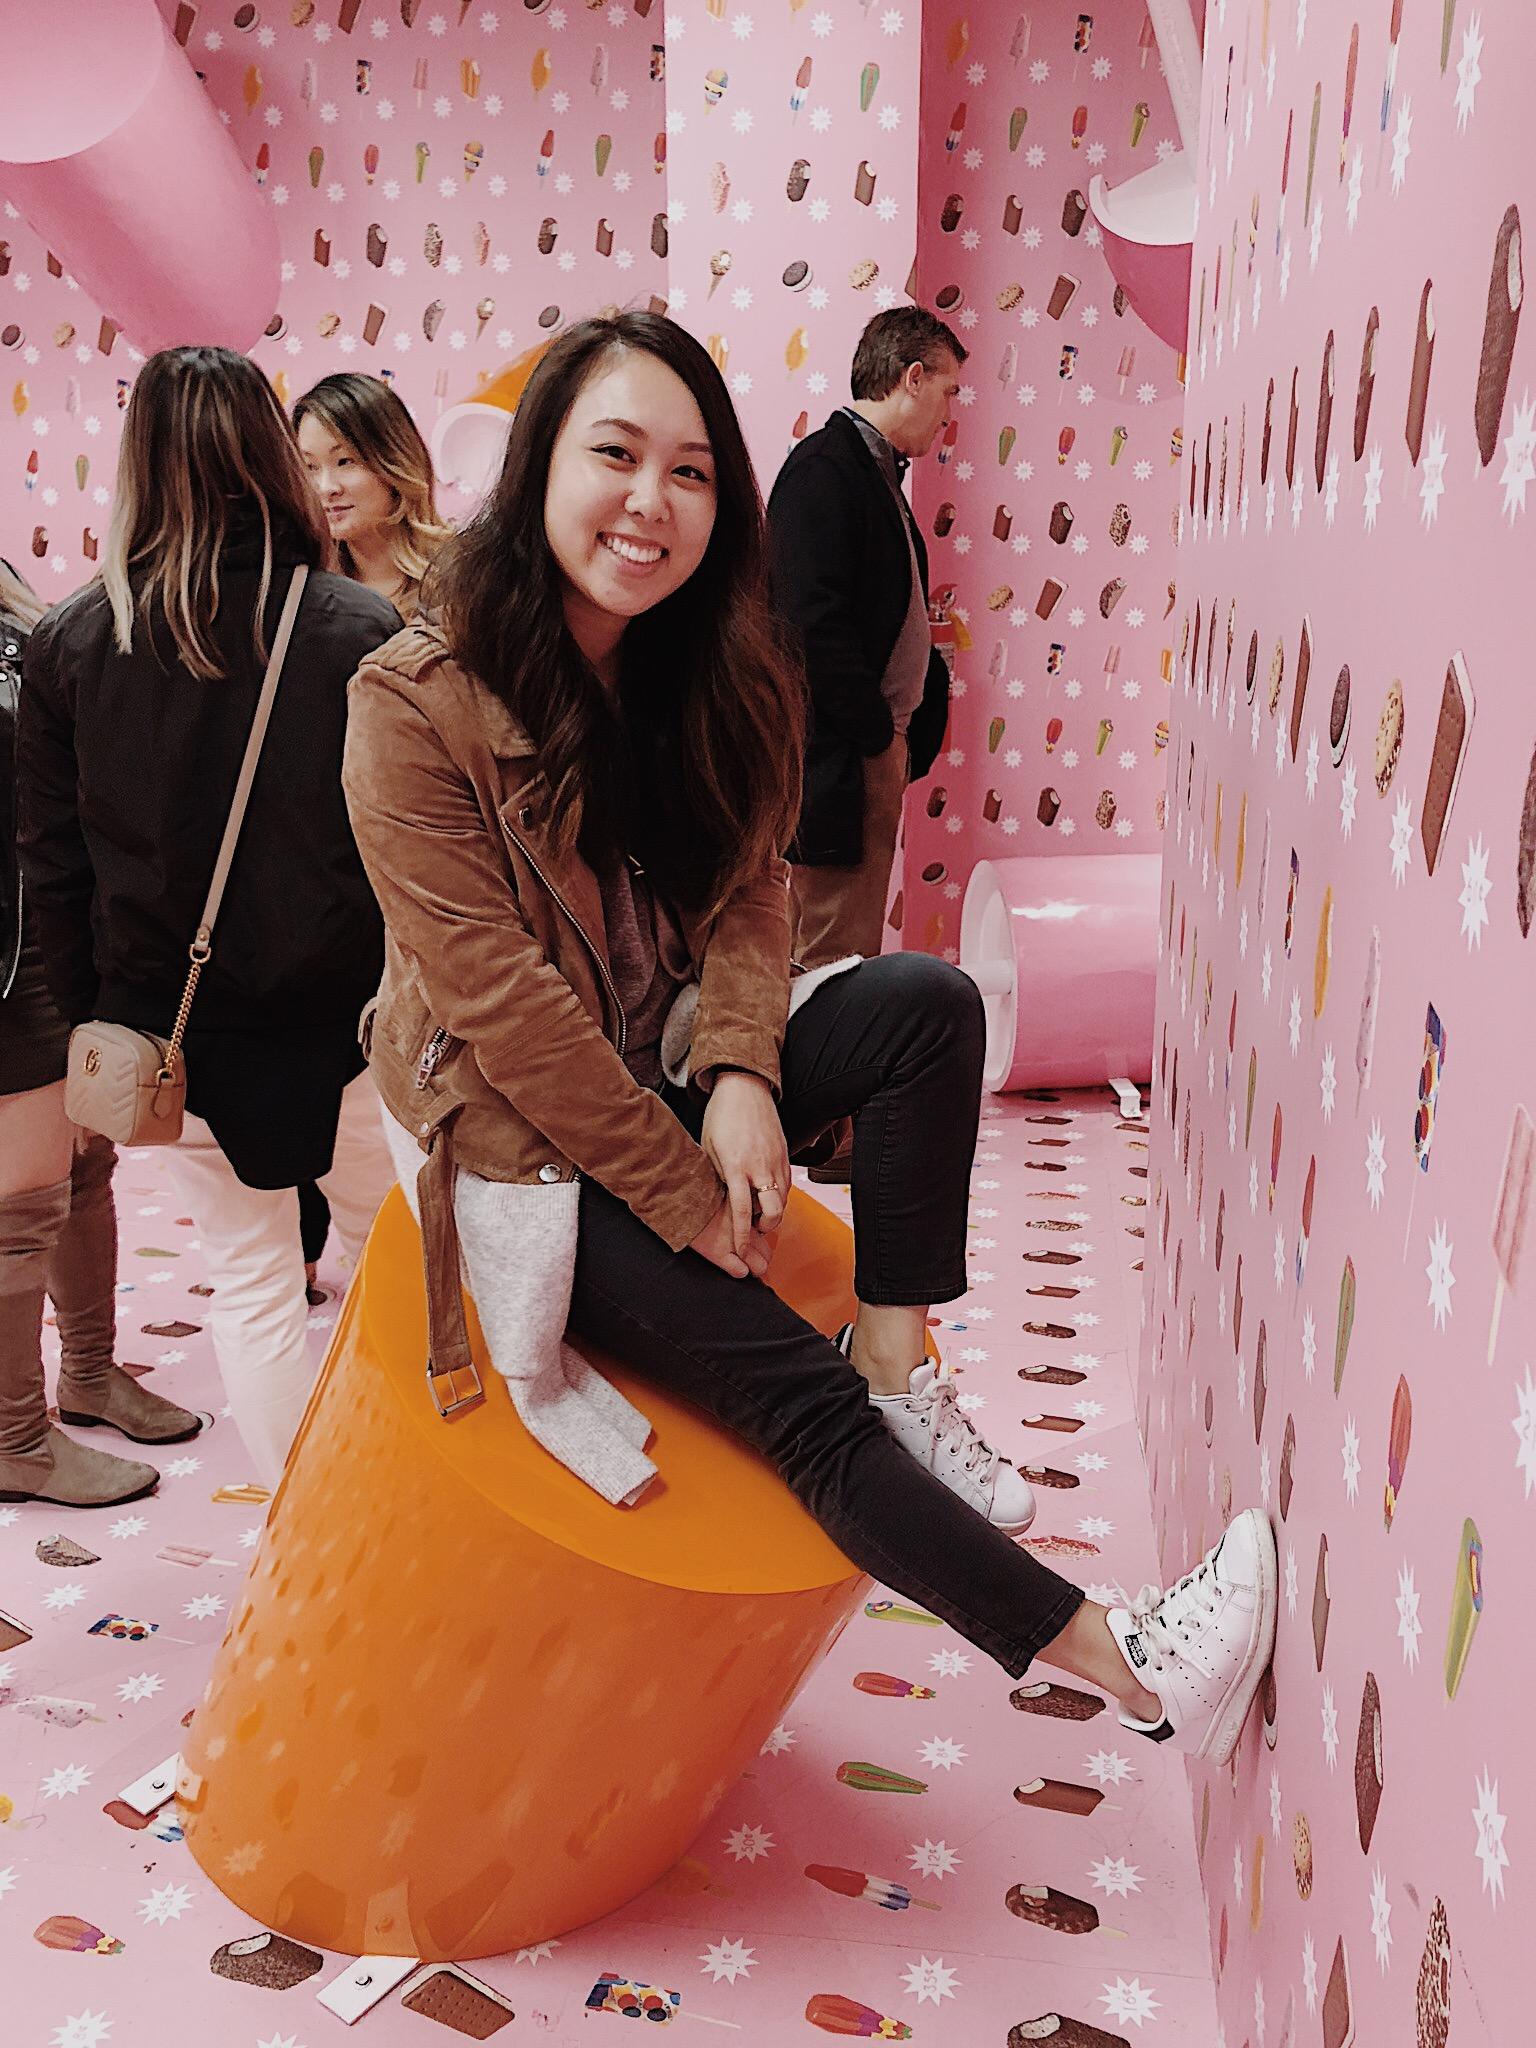 Museum of Ice Cream Milennial Pink Ice Cream Wall Room